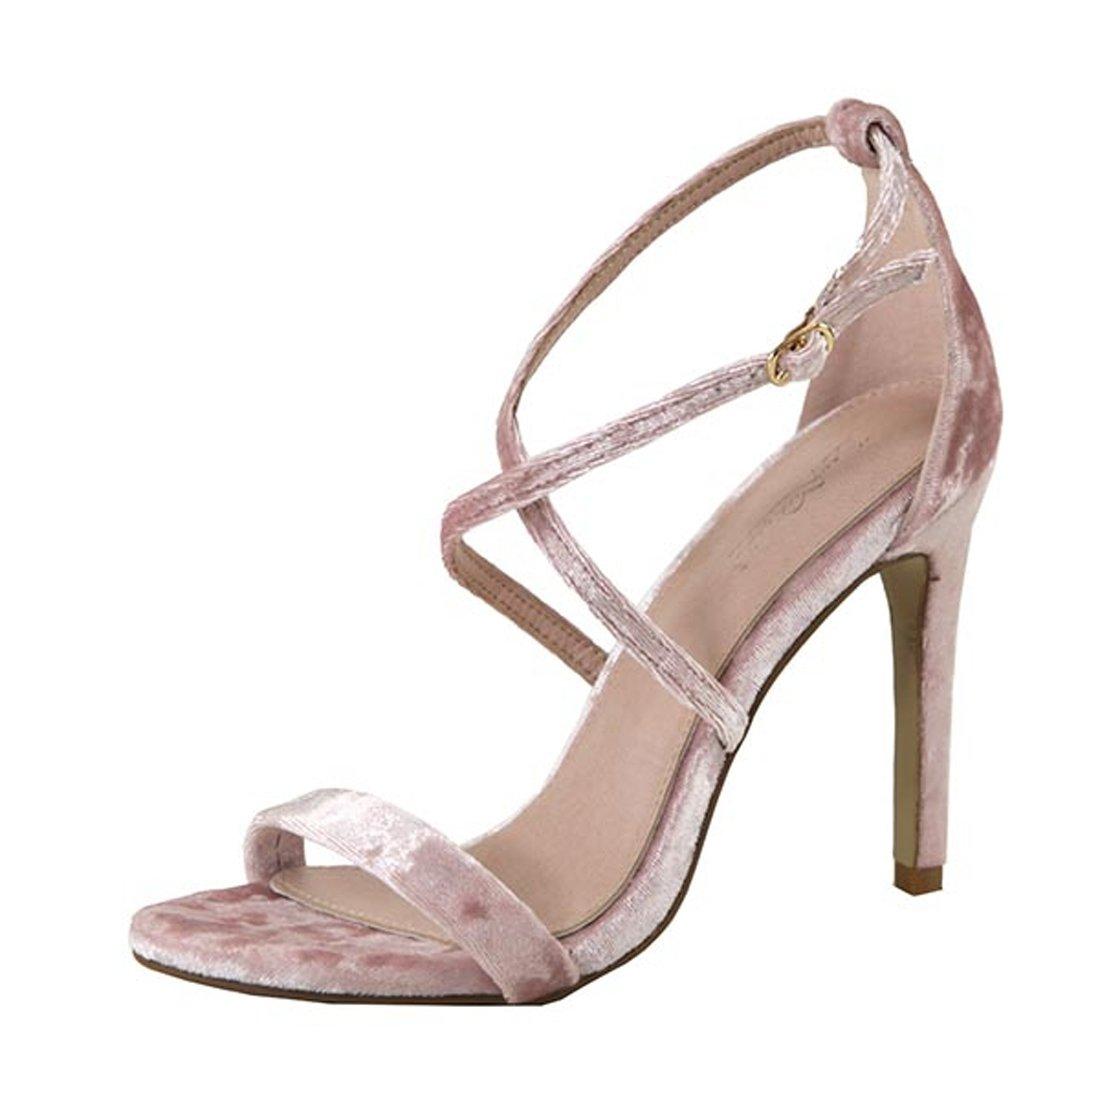 cfde42e9eb8 Amazon.com: Dusty Pink Velvet Open Toe Strappy High Heel Pump Dress ...